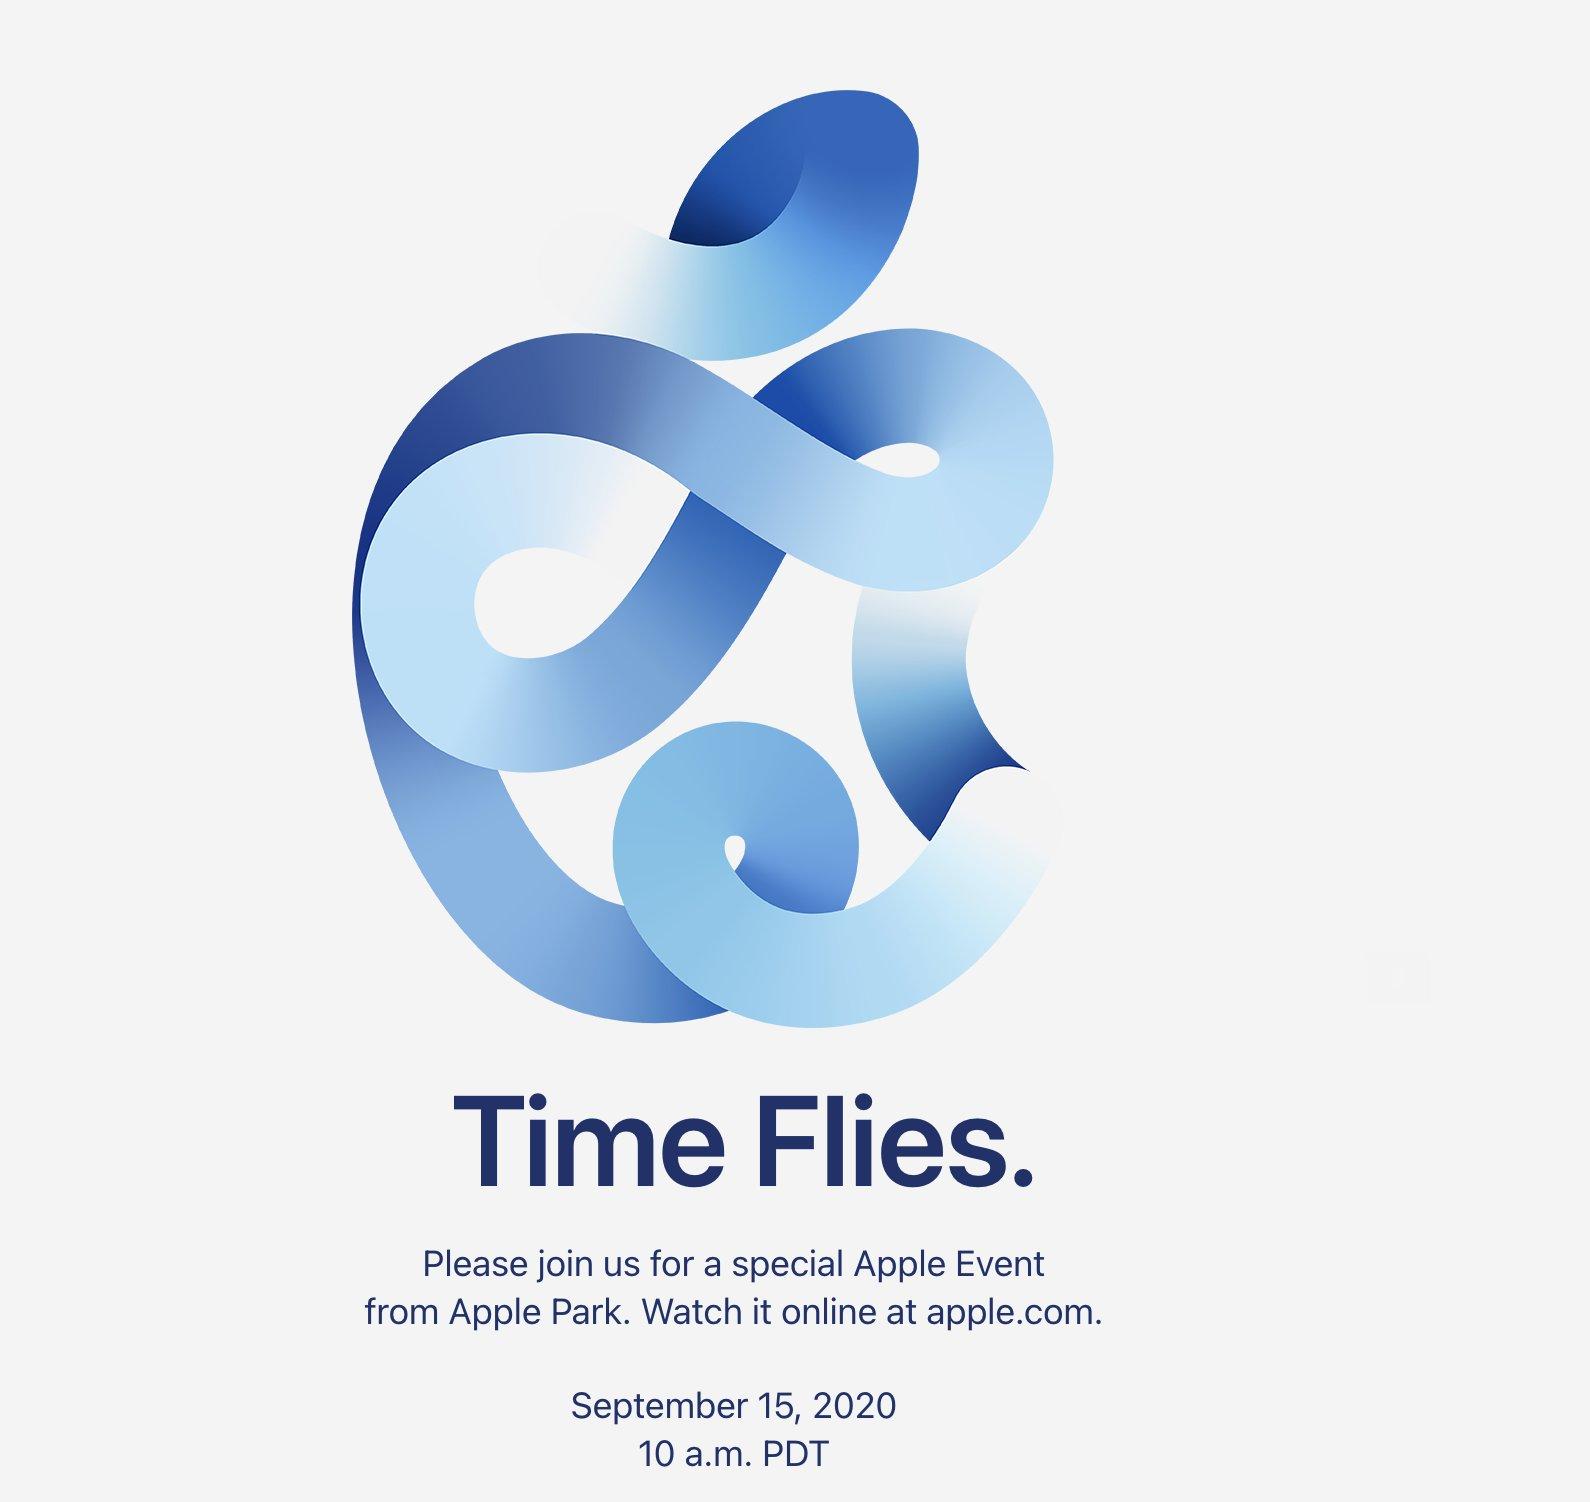 Apple anuncia evento Time Flies |PandaAncha.mx